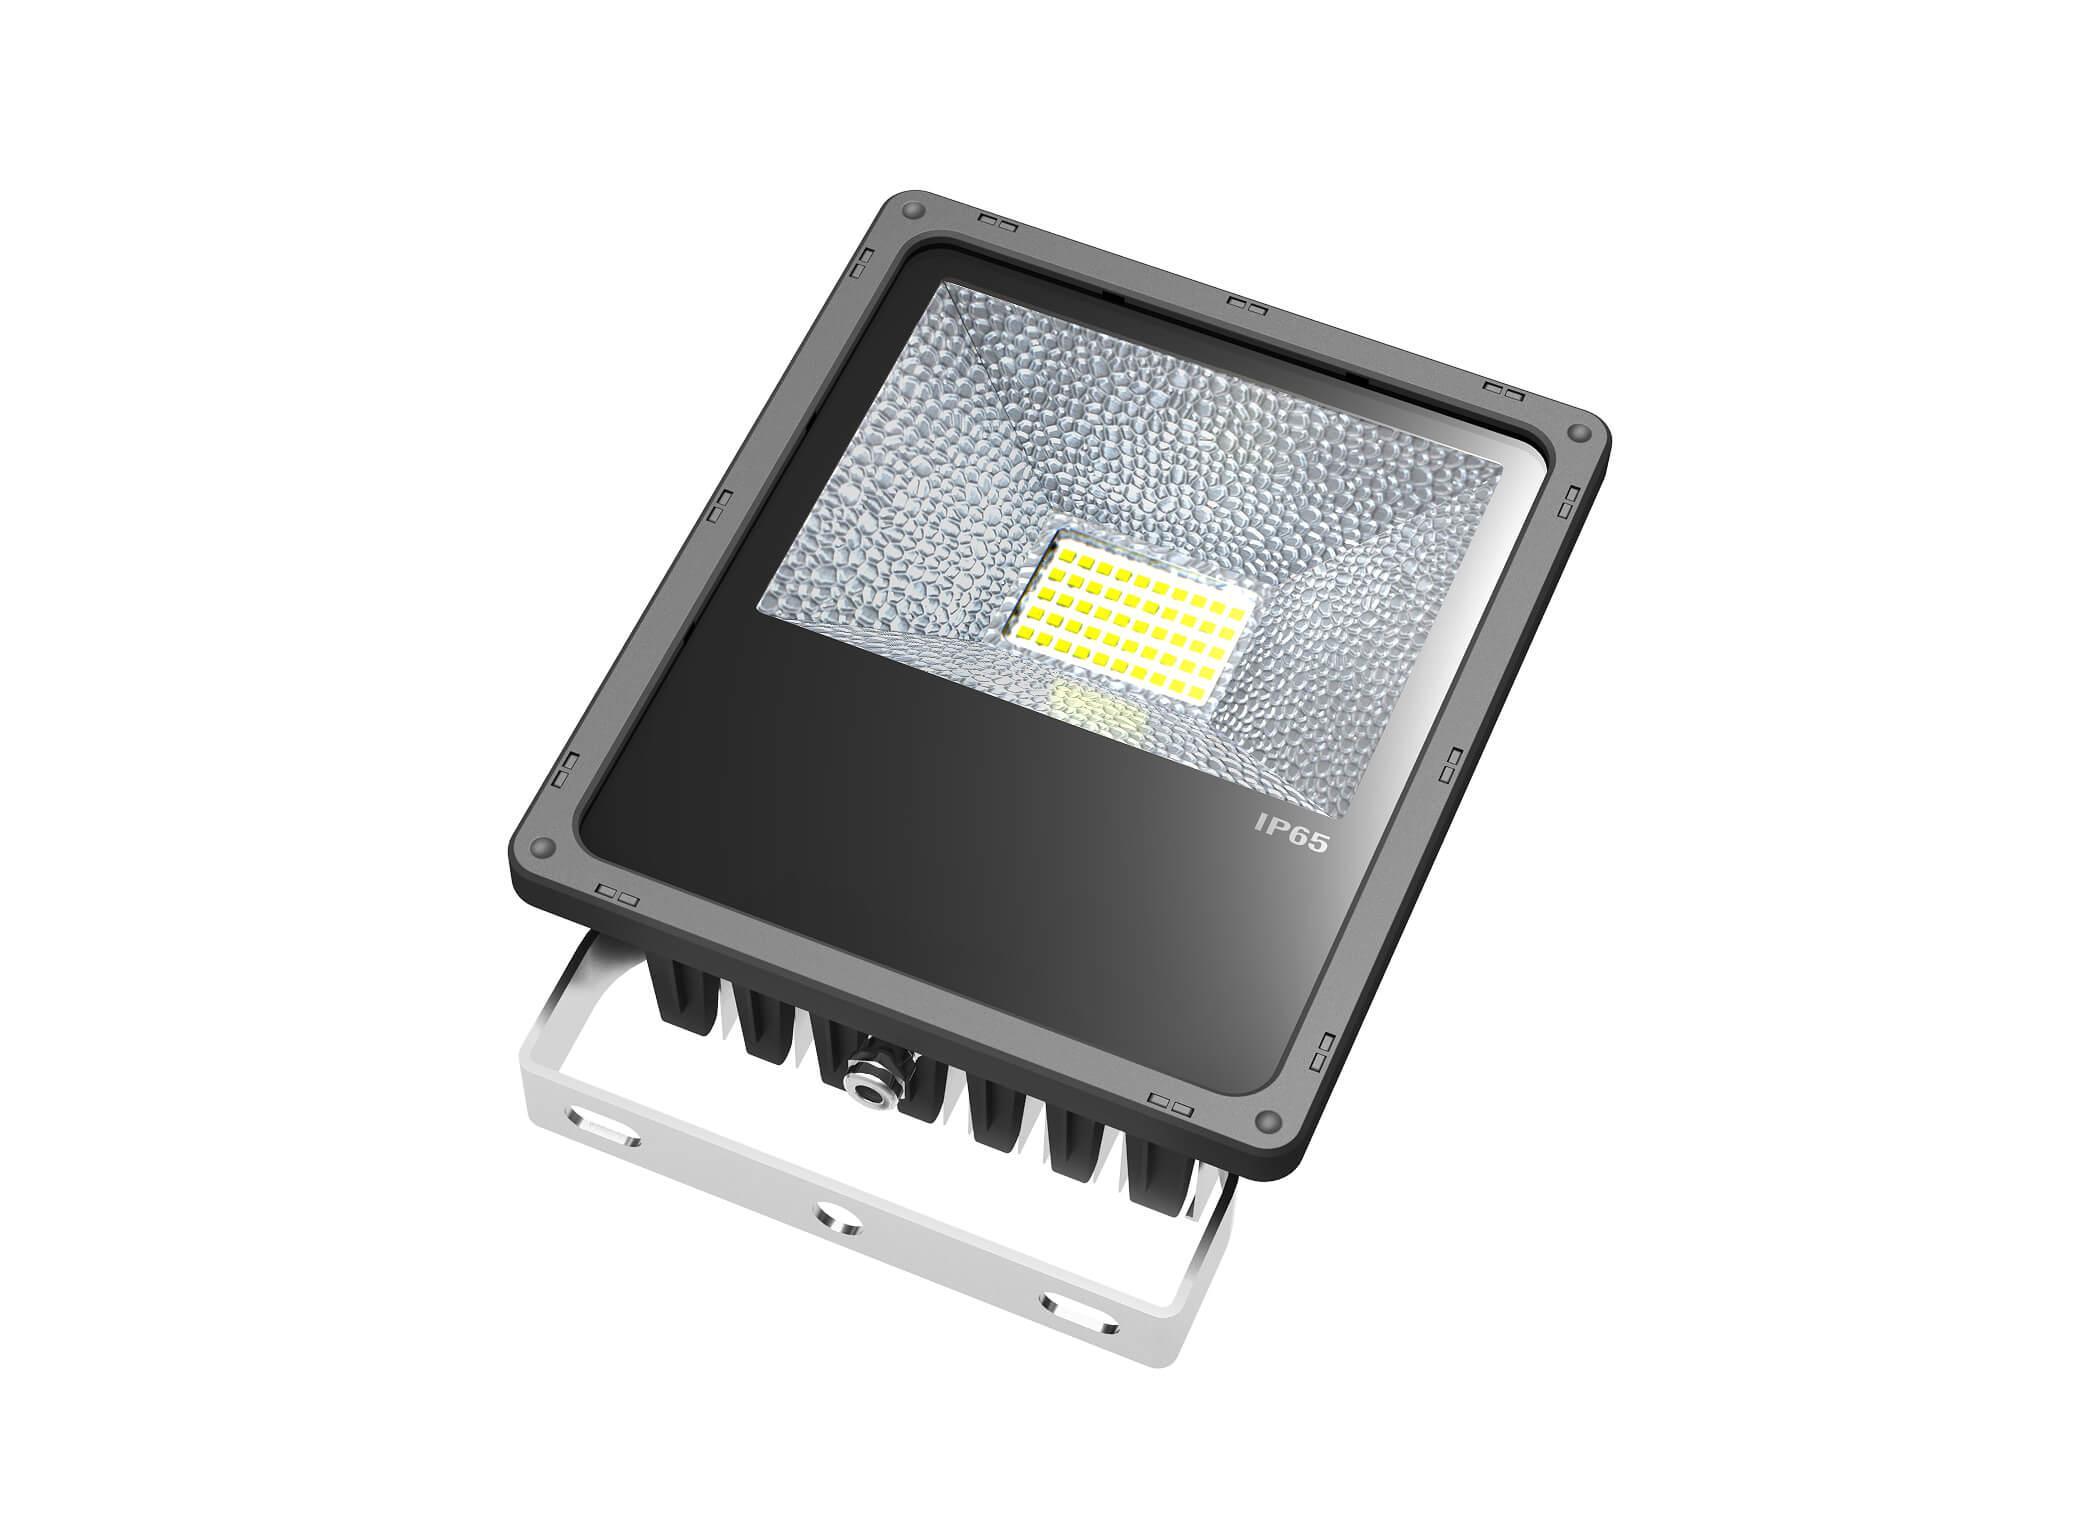 Proyector led exterior 50w iluminaci n led for Iluminacion exterior led